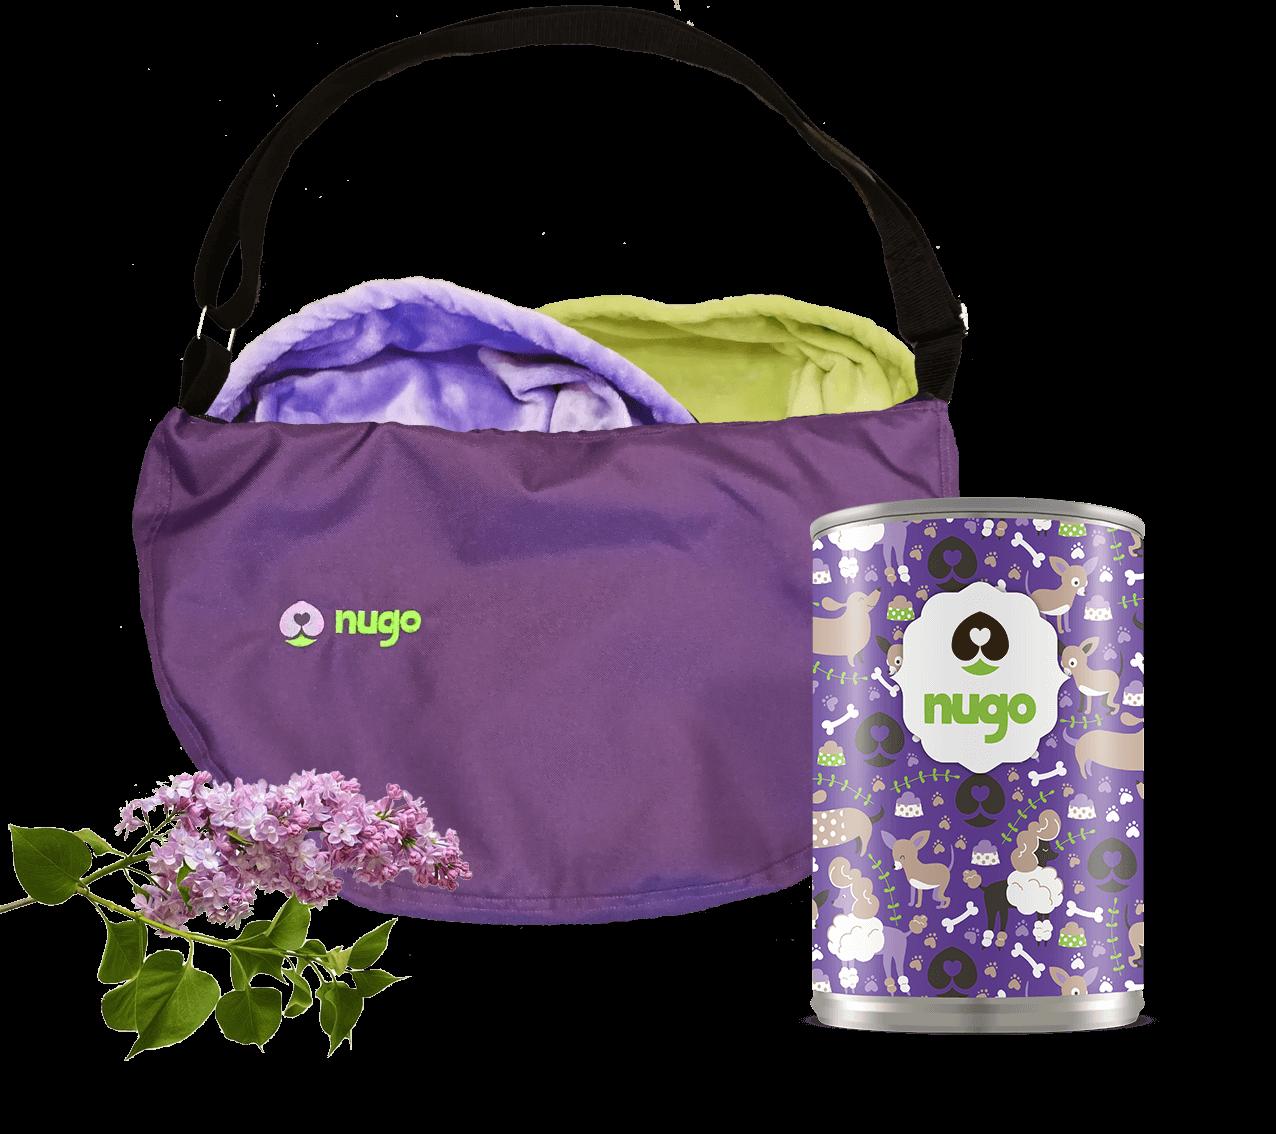 Limitované edice Nugo tašek